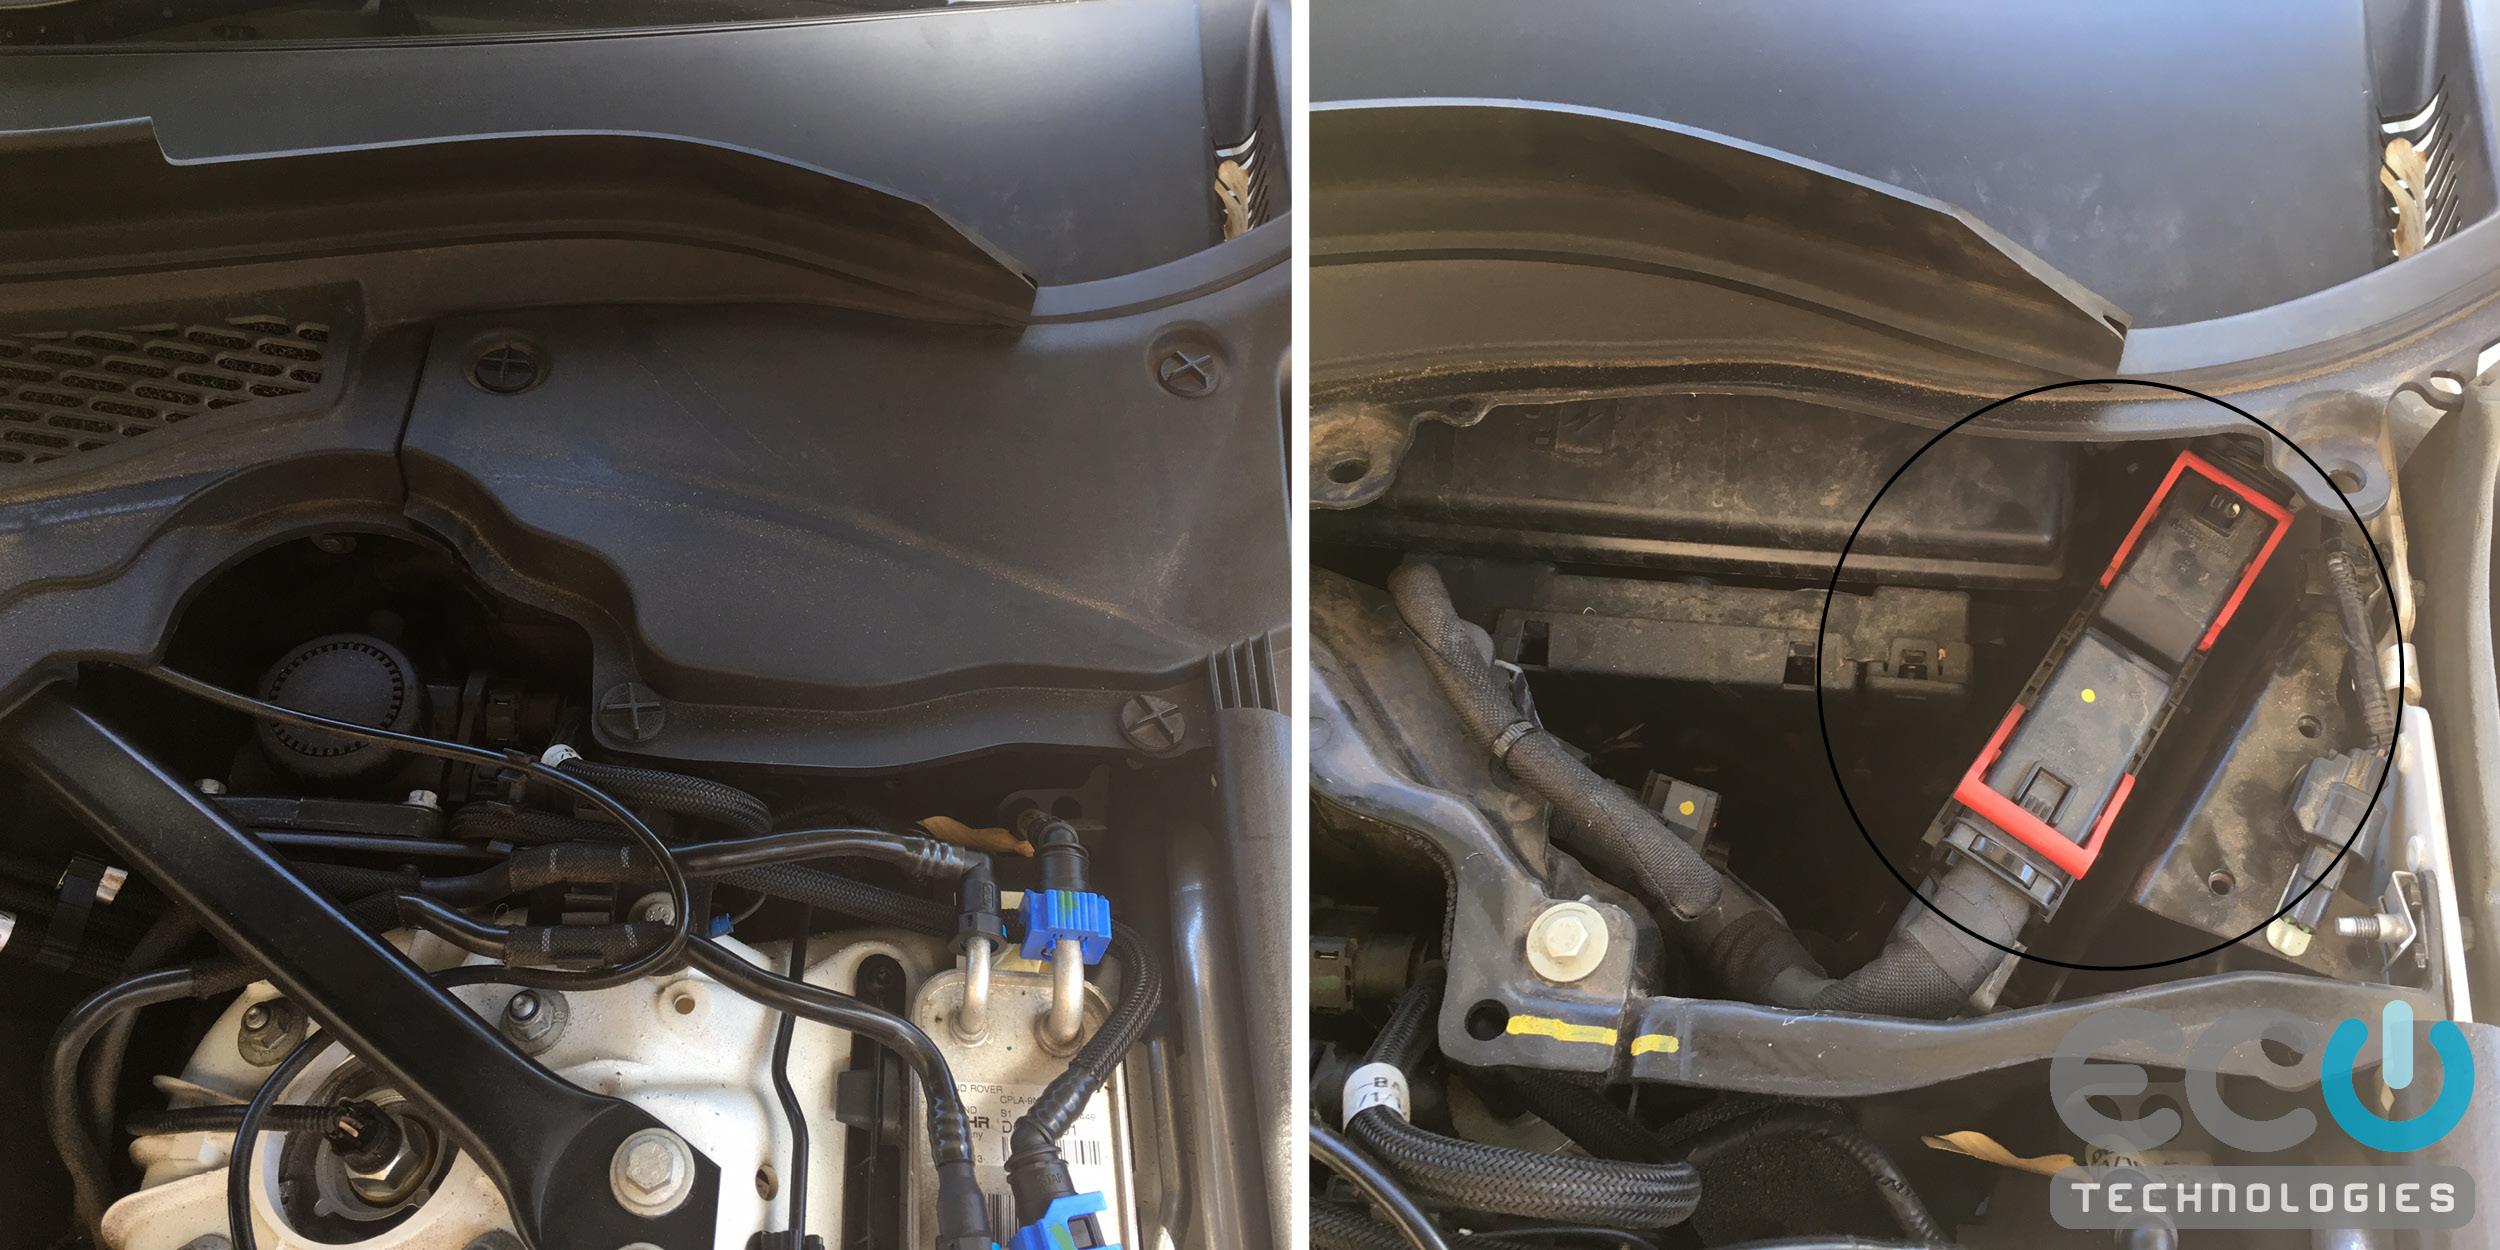 2016 Land Rover Range Rover L405 MK2 4 4 SDV8 for Chiptuning, Engine